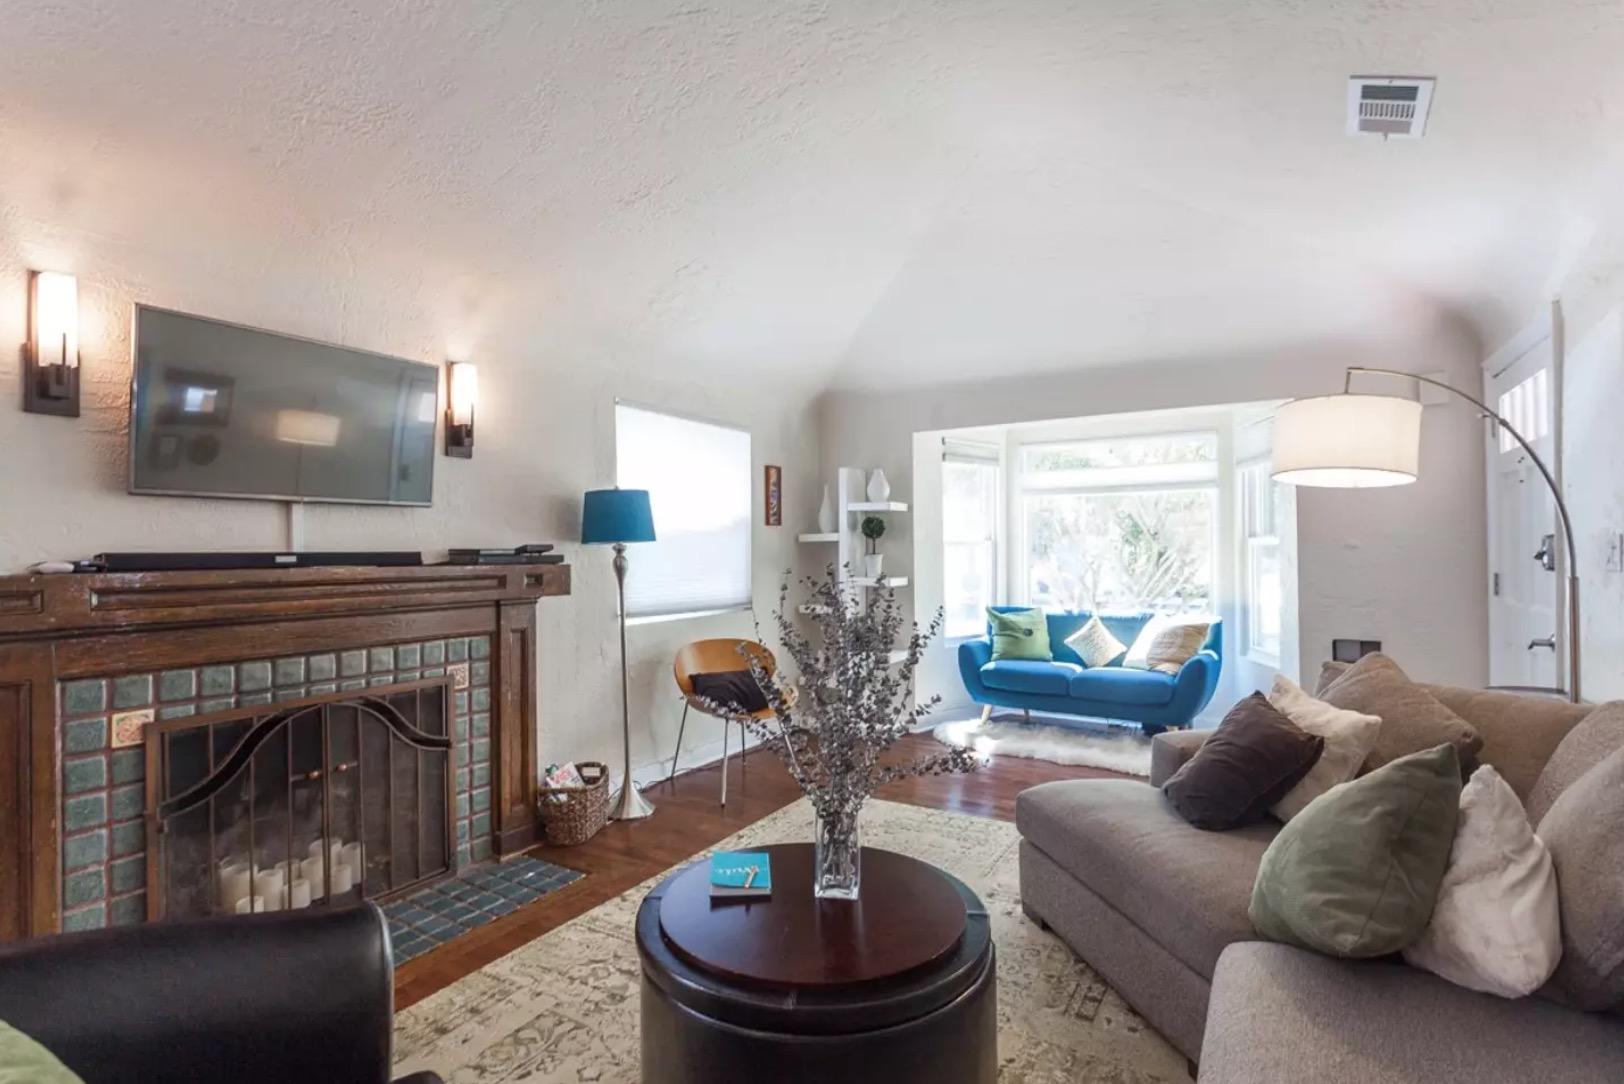 4-bedroom-airbnb-home-culver-city.jpg